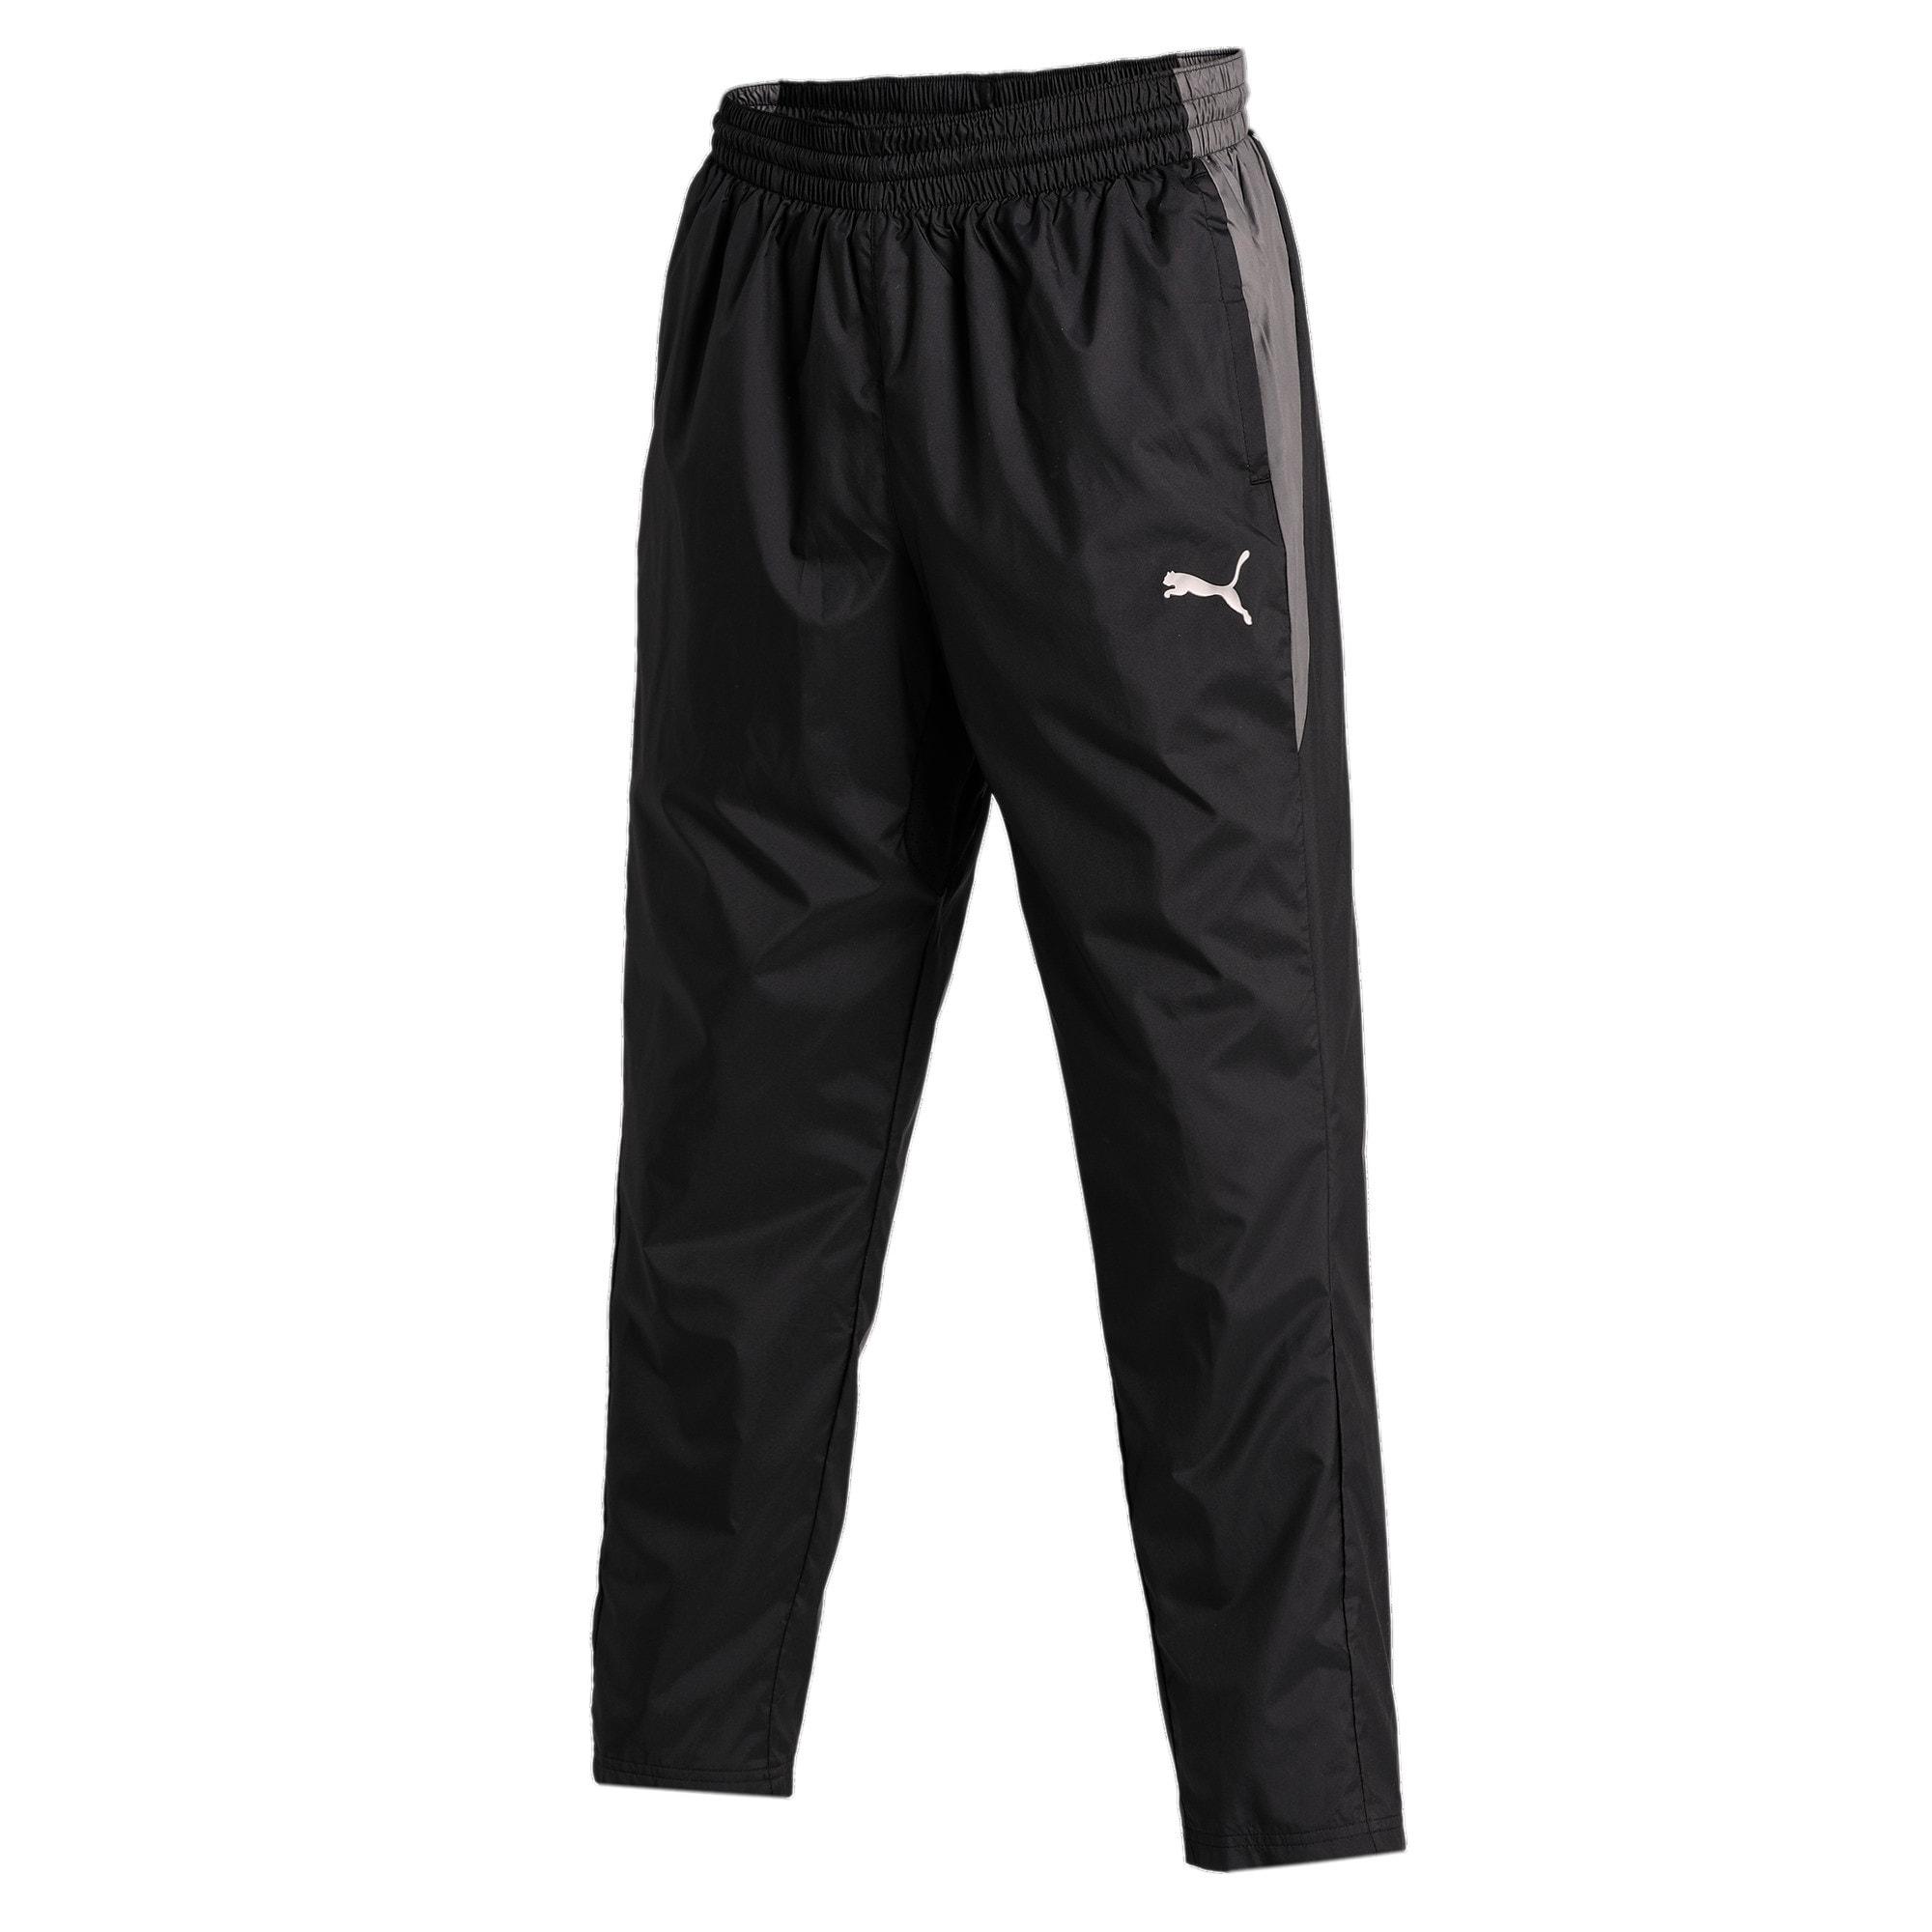 Thumbnail 4 of Reactive Woven Men's Training Pants, Puma Black-CASTLEROCK, medium-IND